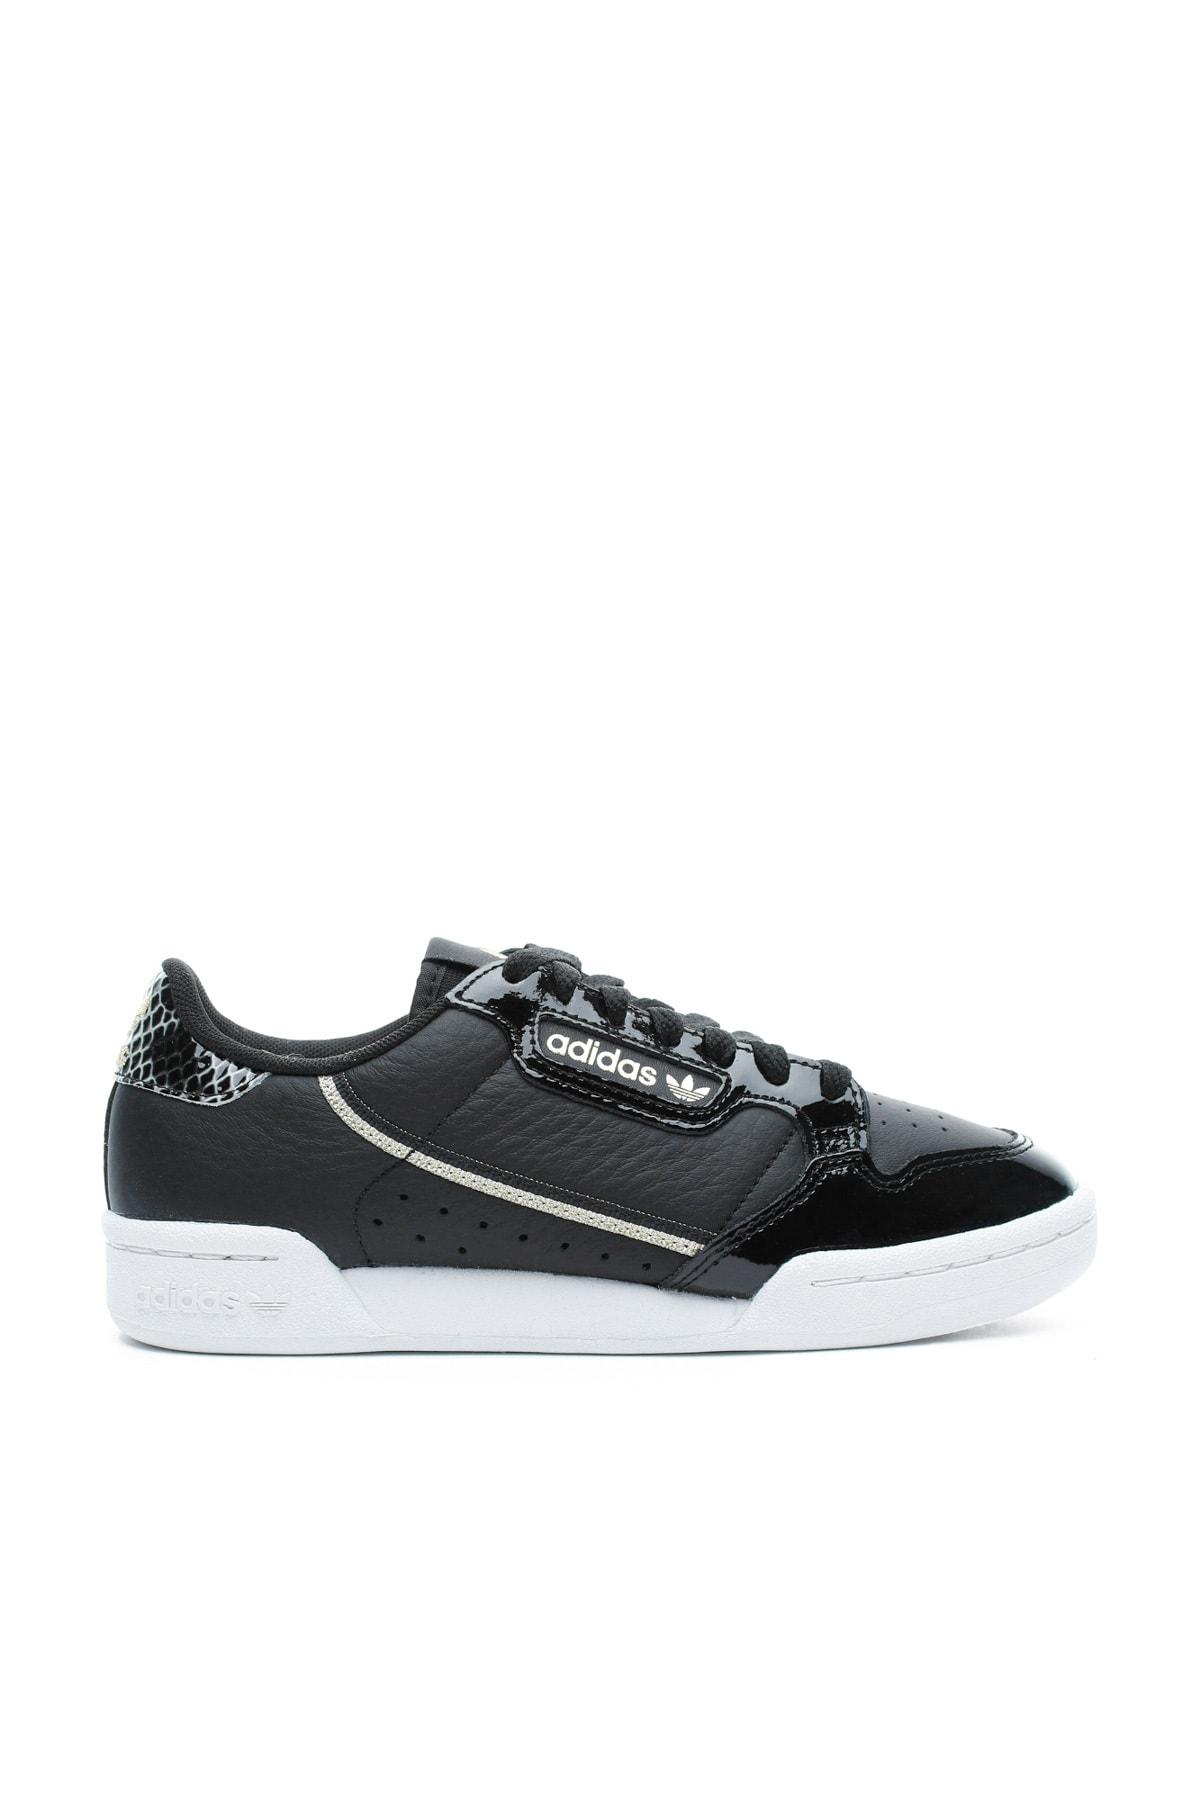 adidas Continental 80 Kadın Siyah Spor Ayakkabı 1